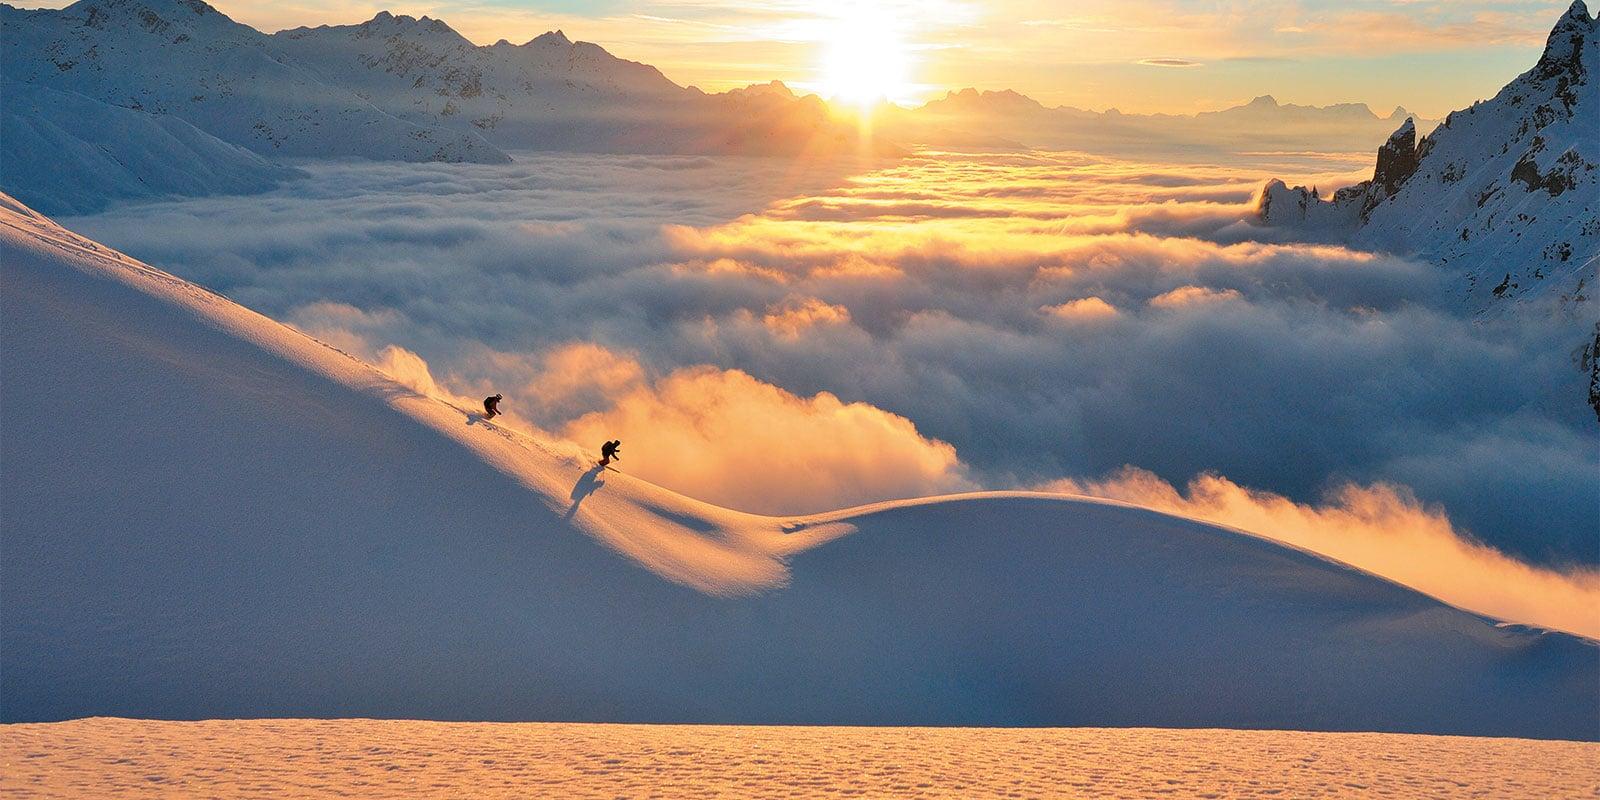 skifahren-titelbild1-sepp-mallaun-lech-zuers-tourismus